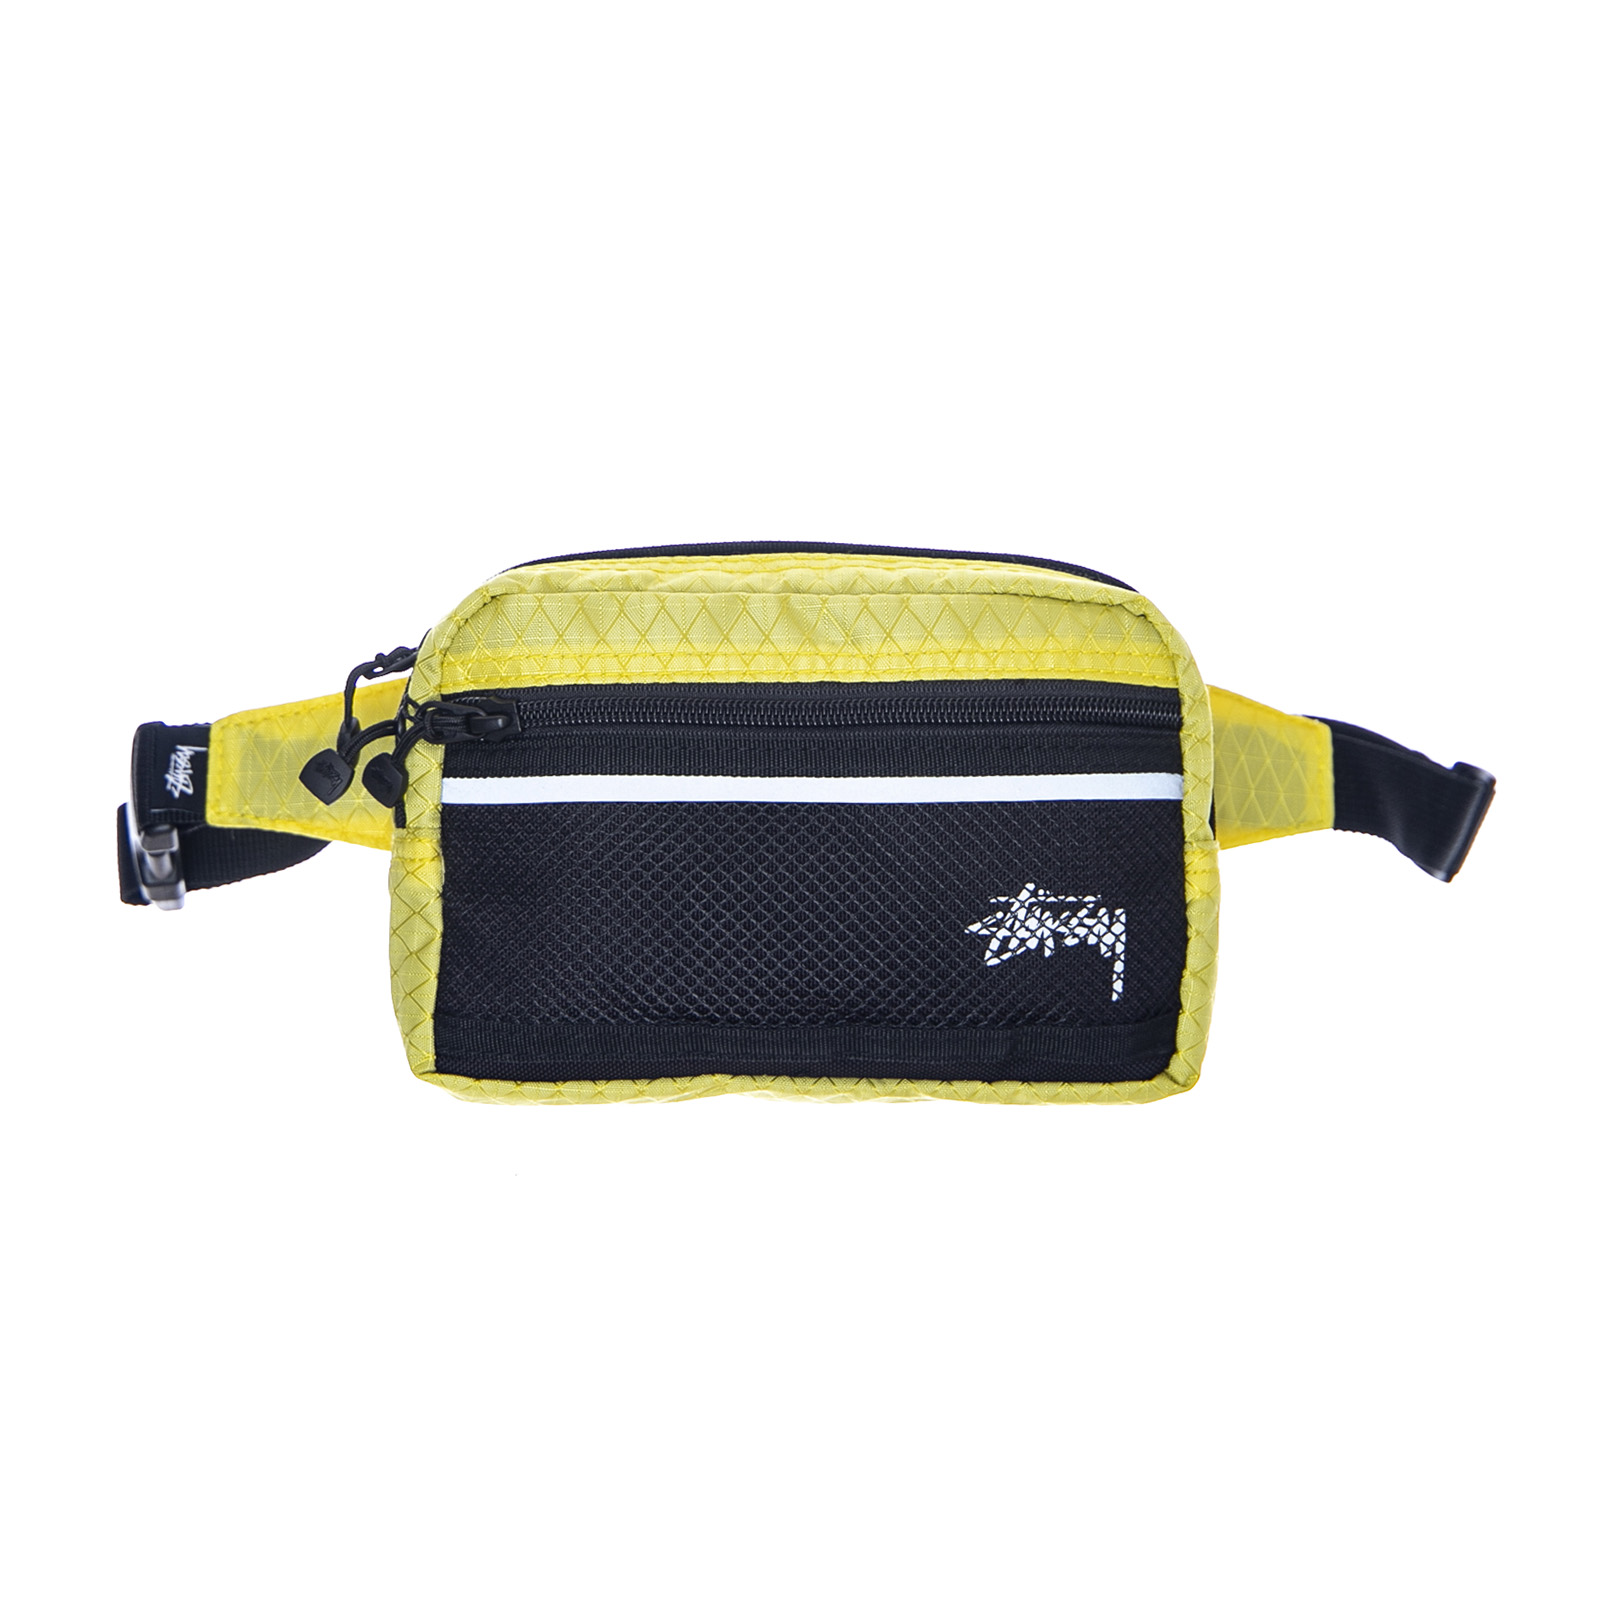 24588e5f72a Stussy Diamond Ripstop - Violet - Bum Bag Multicolour | eBay